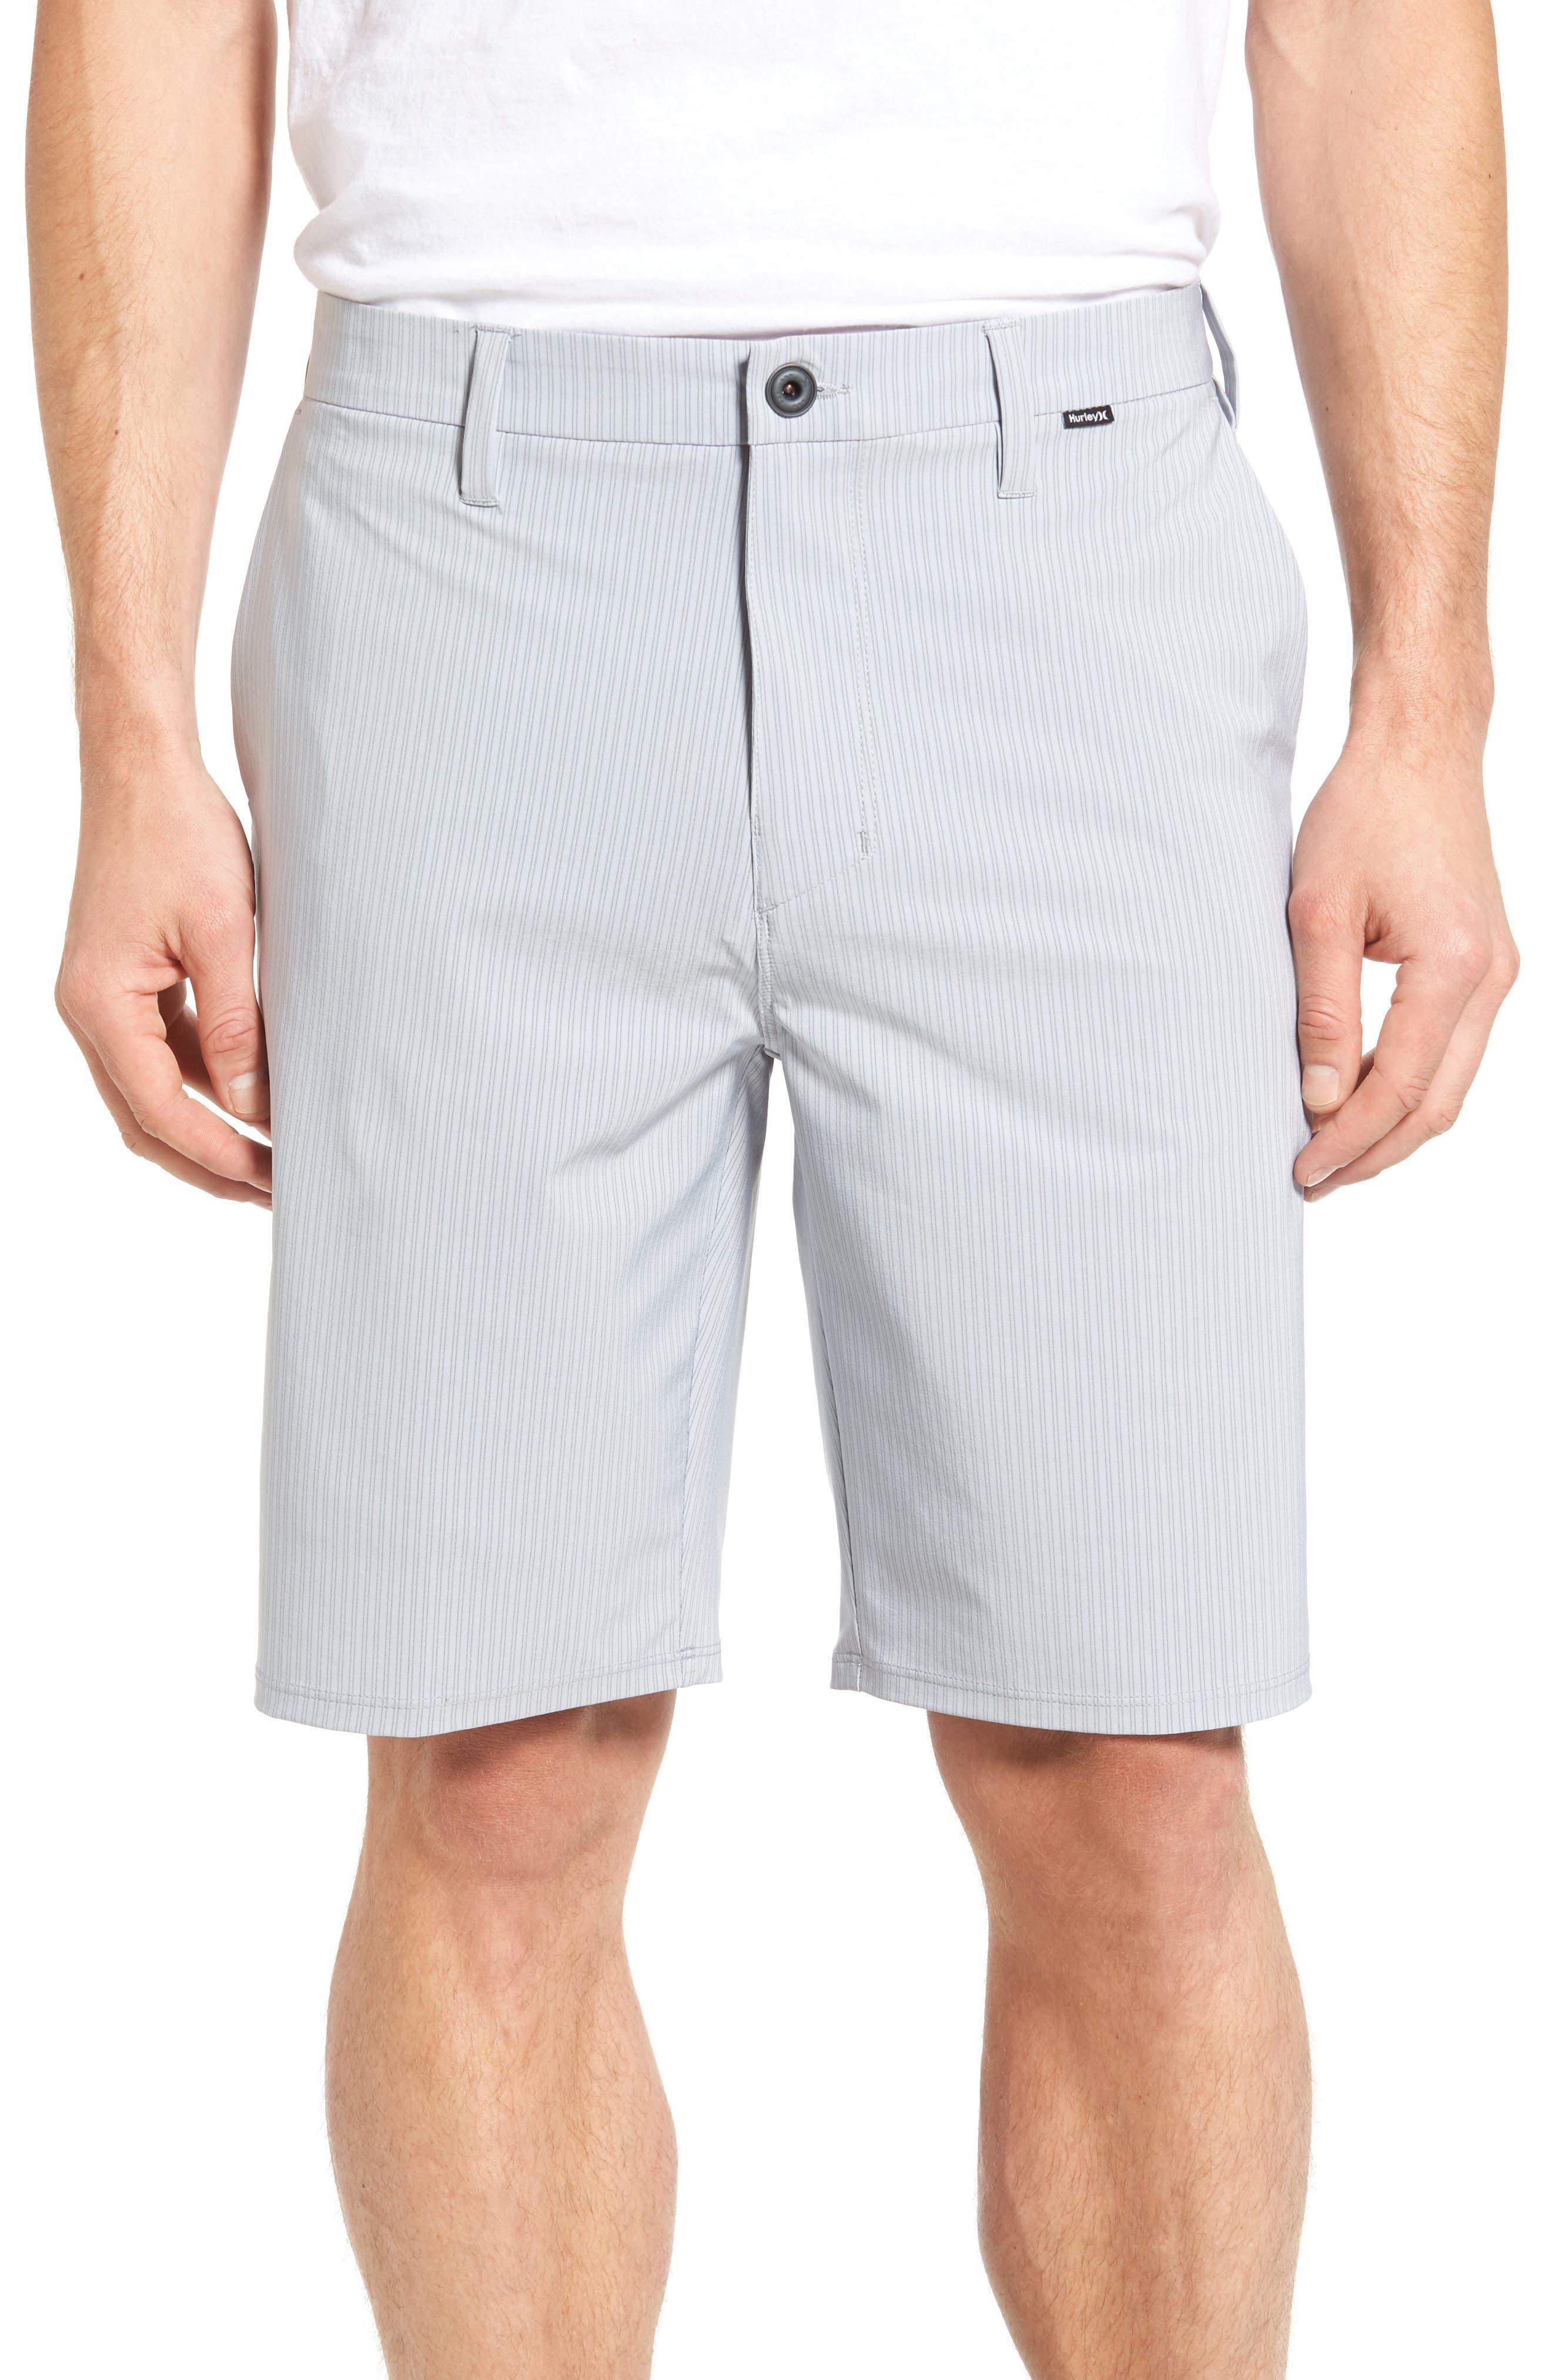 Hurley Phantom Friction Shorts